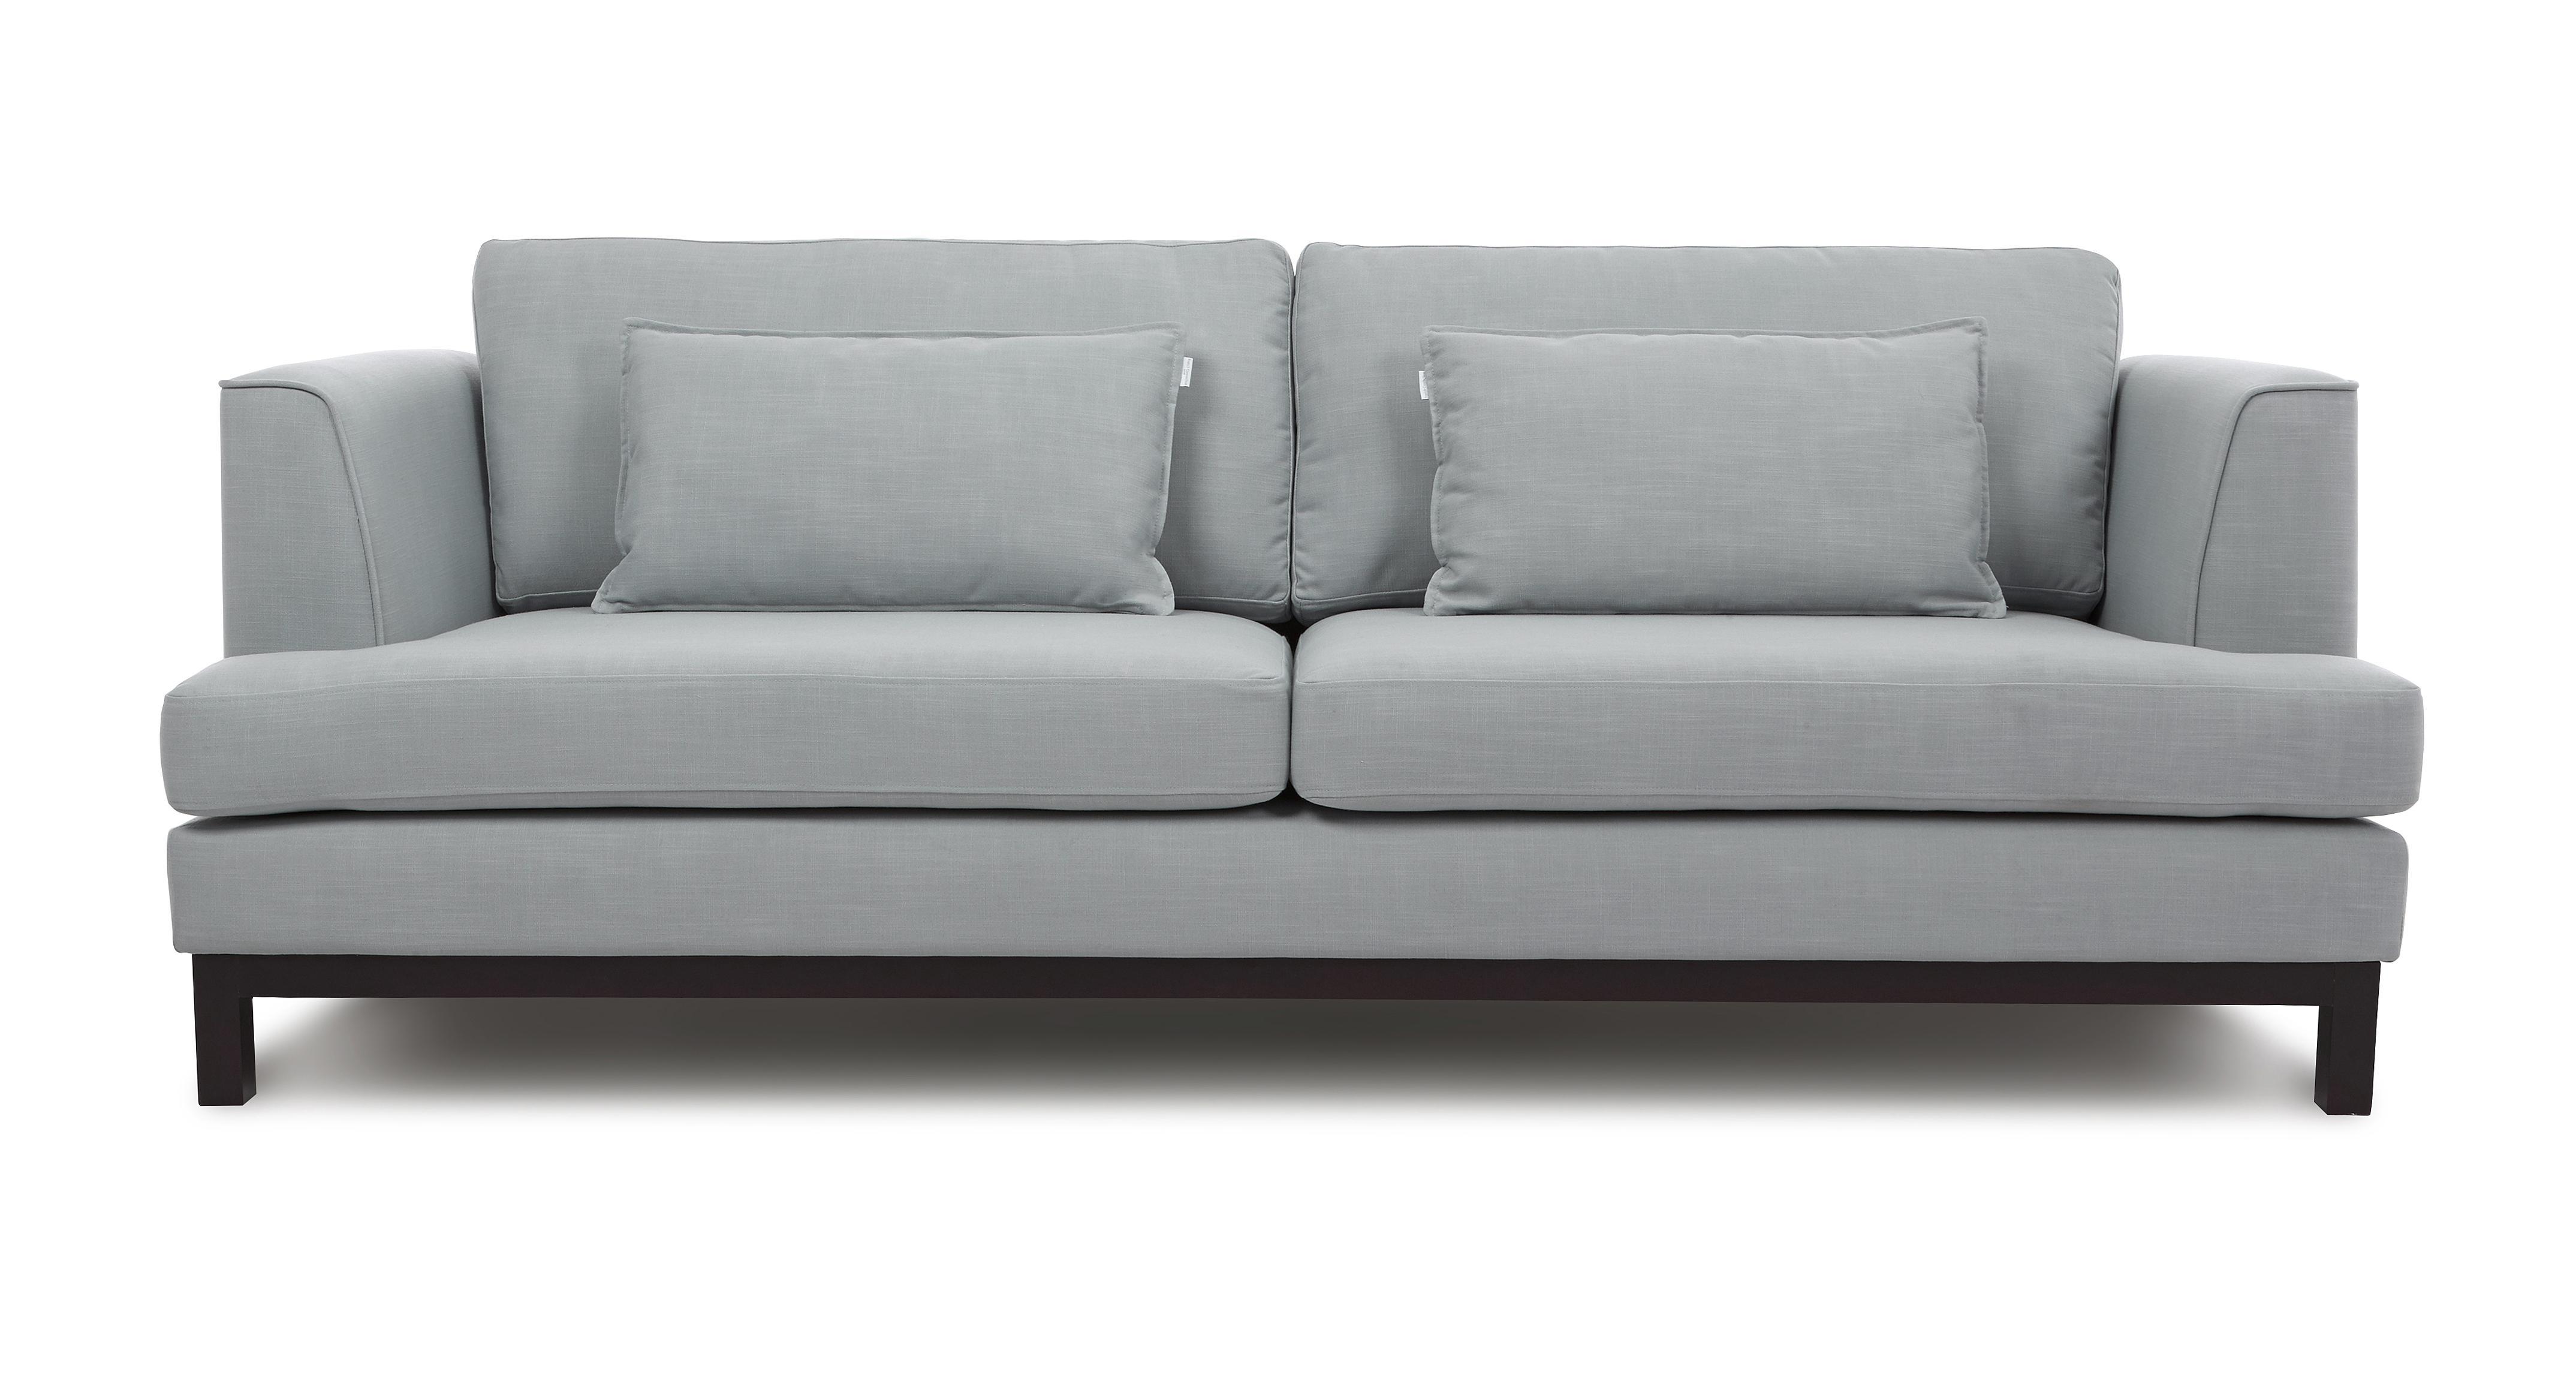 French furniture sofa - French Furniture Sofa 58